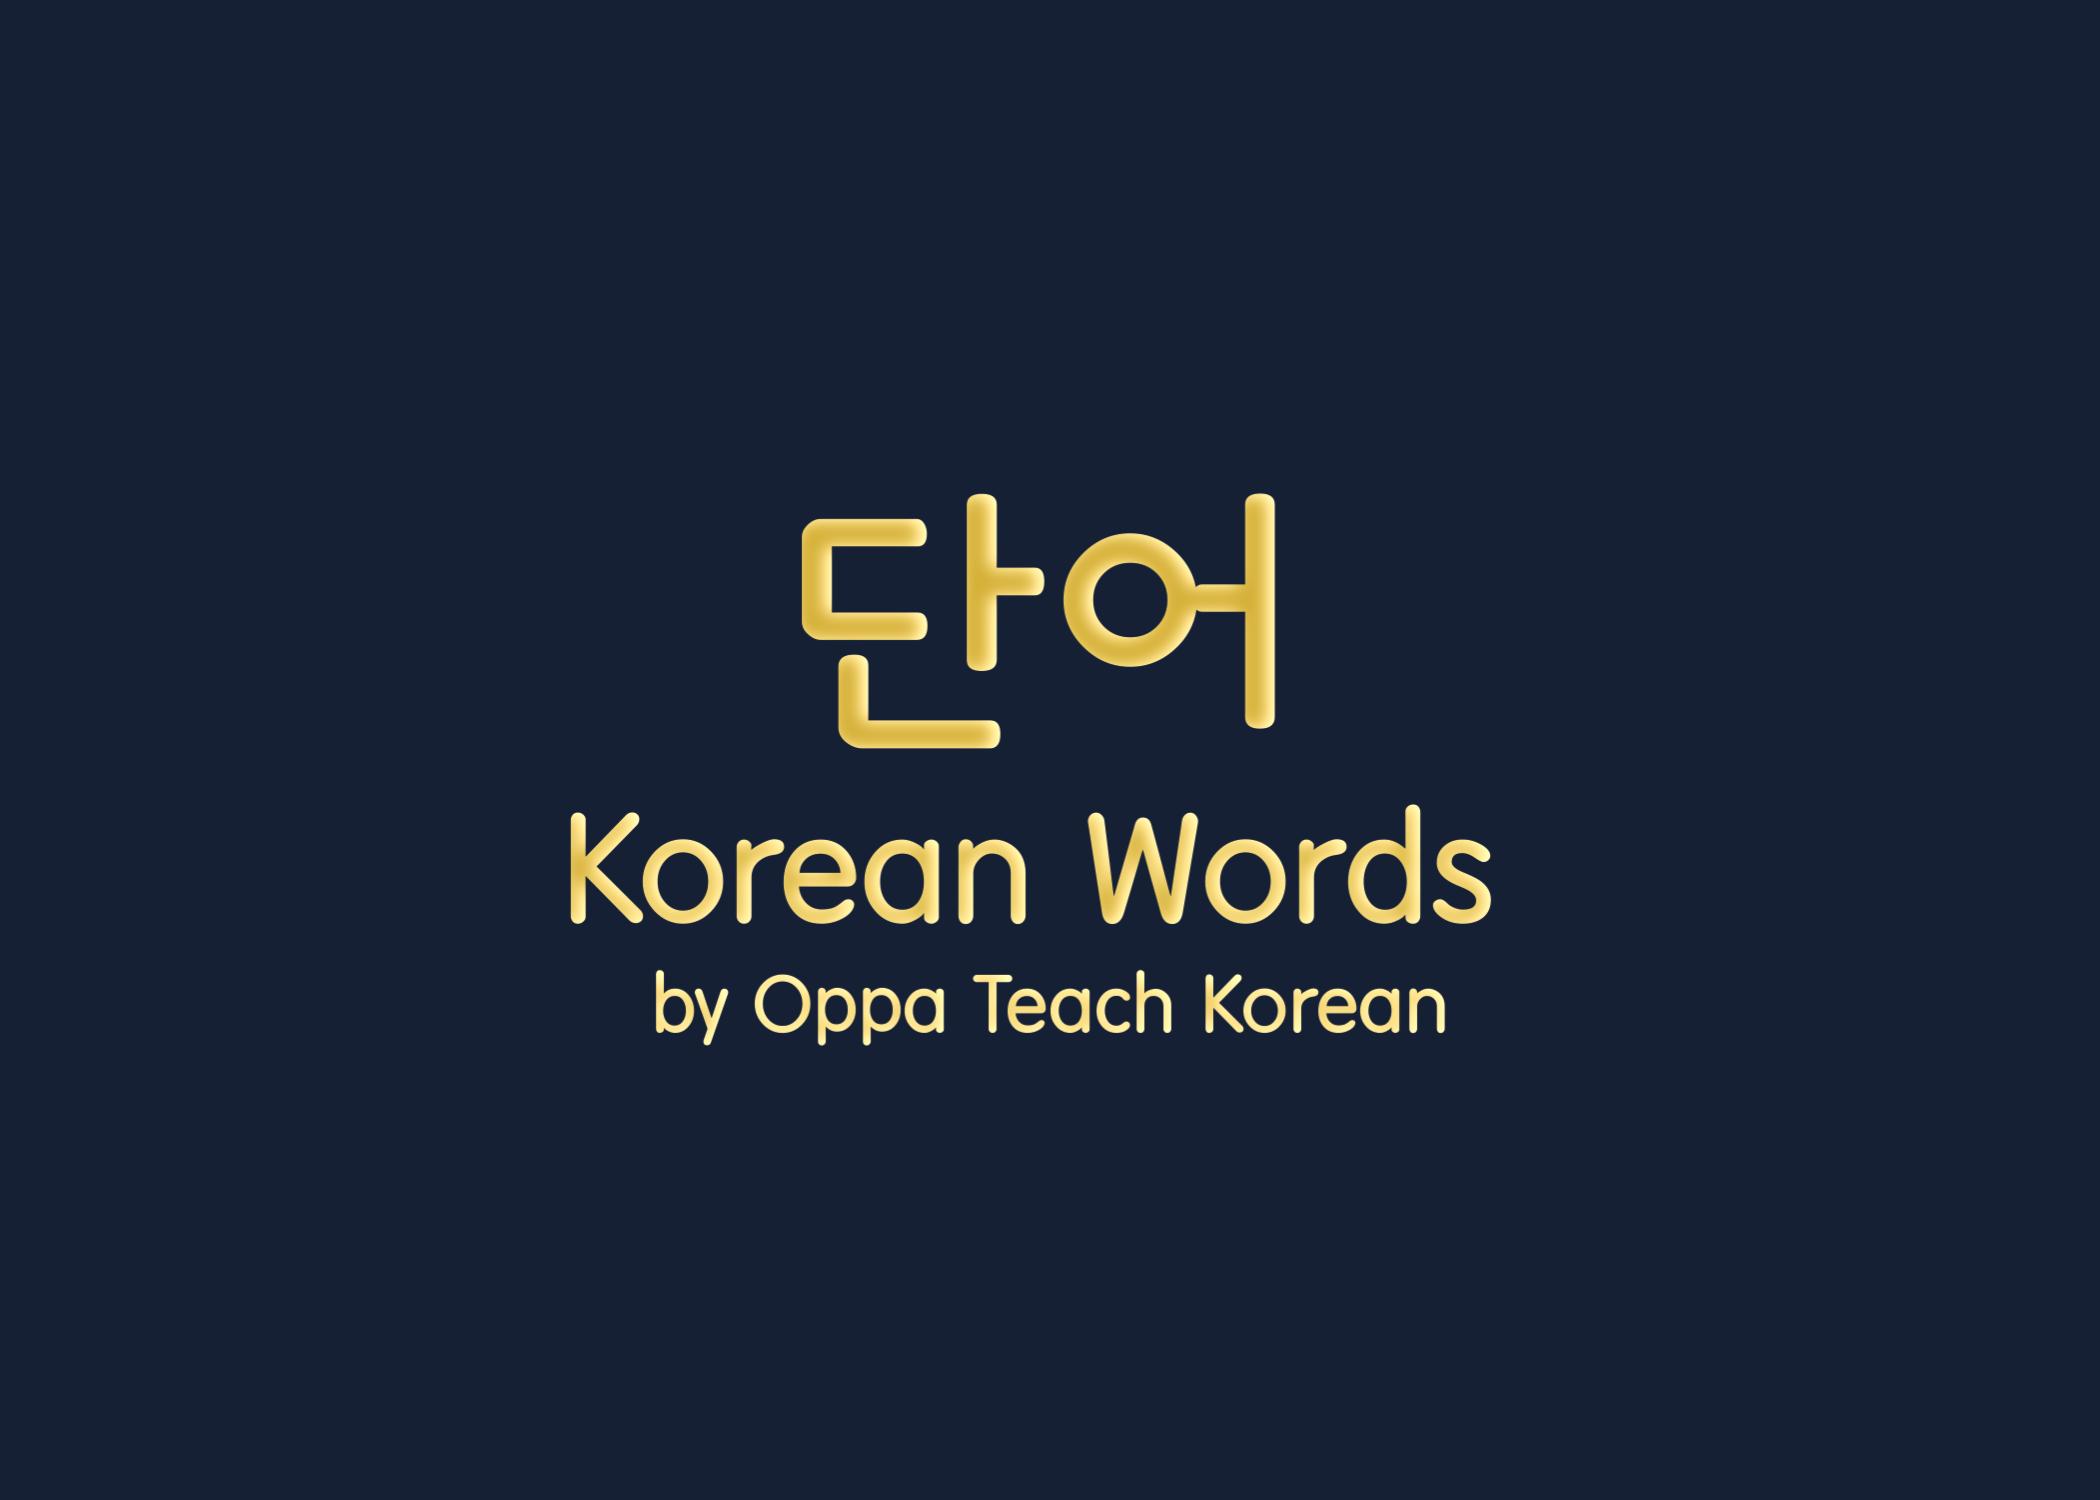 Pin by Oppa Teach Korean on Korean Class Korean words